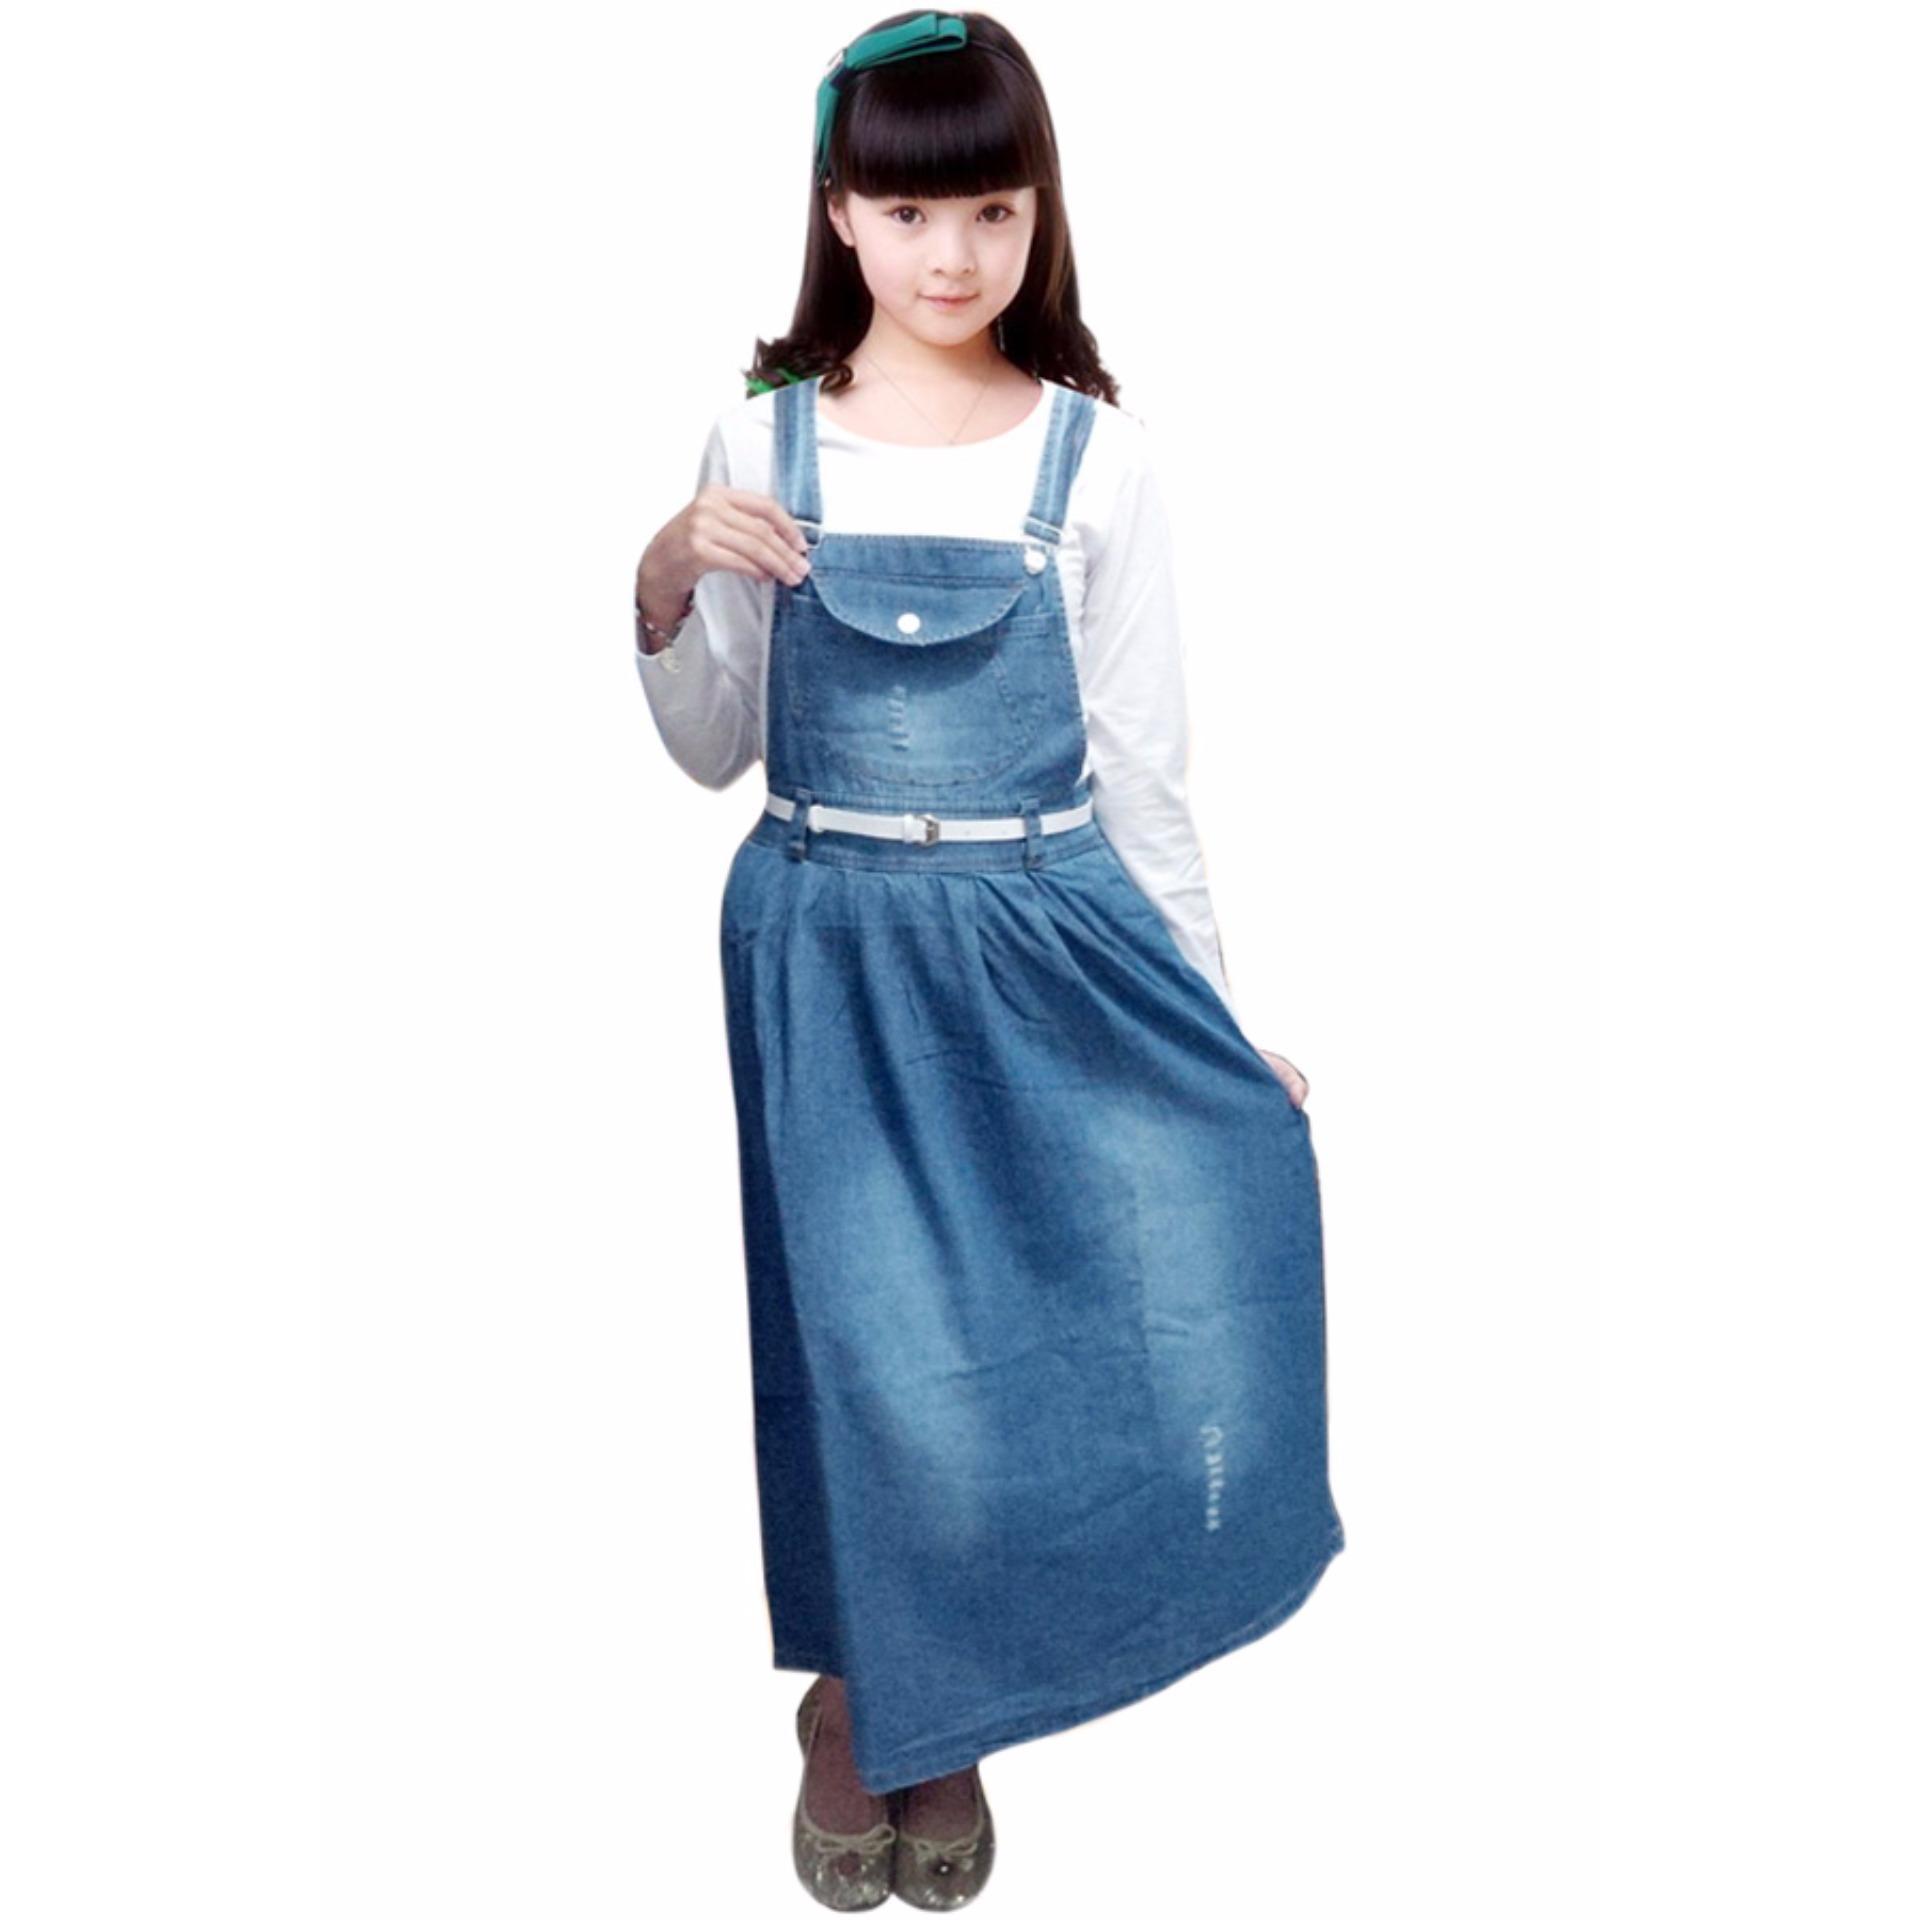 Bananana Plain Ripped Overall Skirt Blue Diskon Akhir Tahun